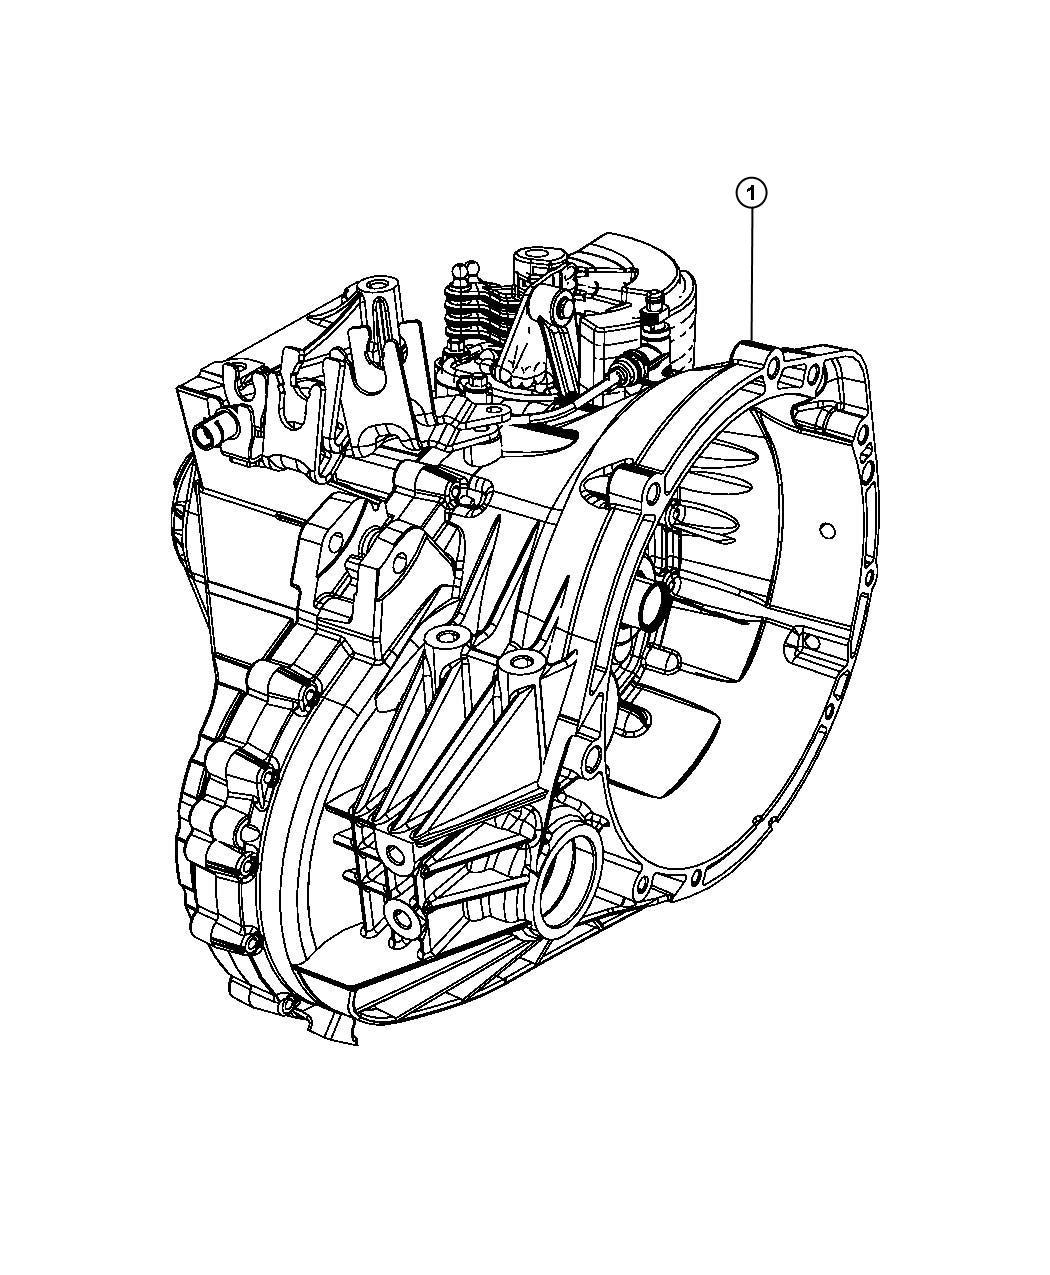 Dodge Caliber Srt4 2 4l 4 Cyl Dohc 16v Turbo 6